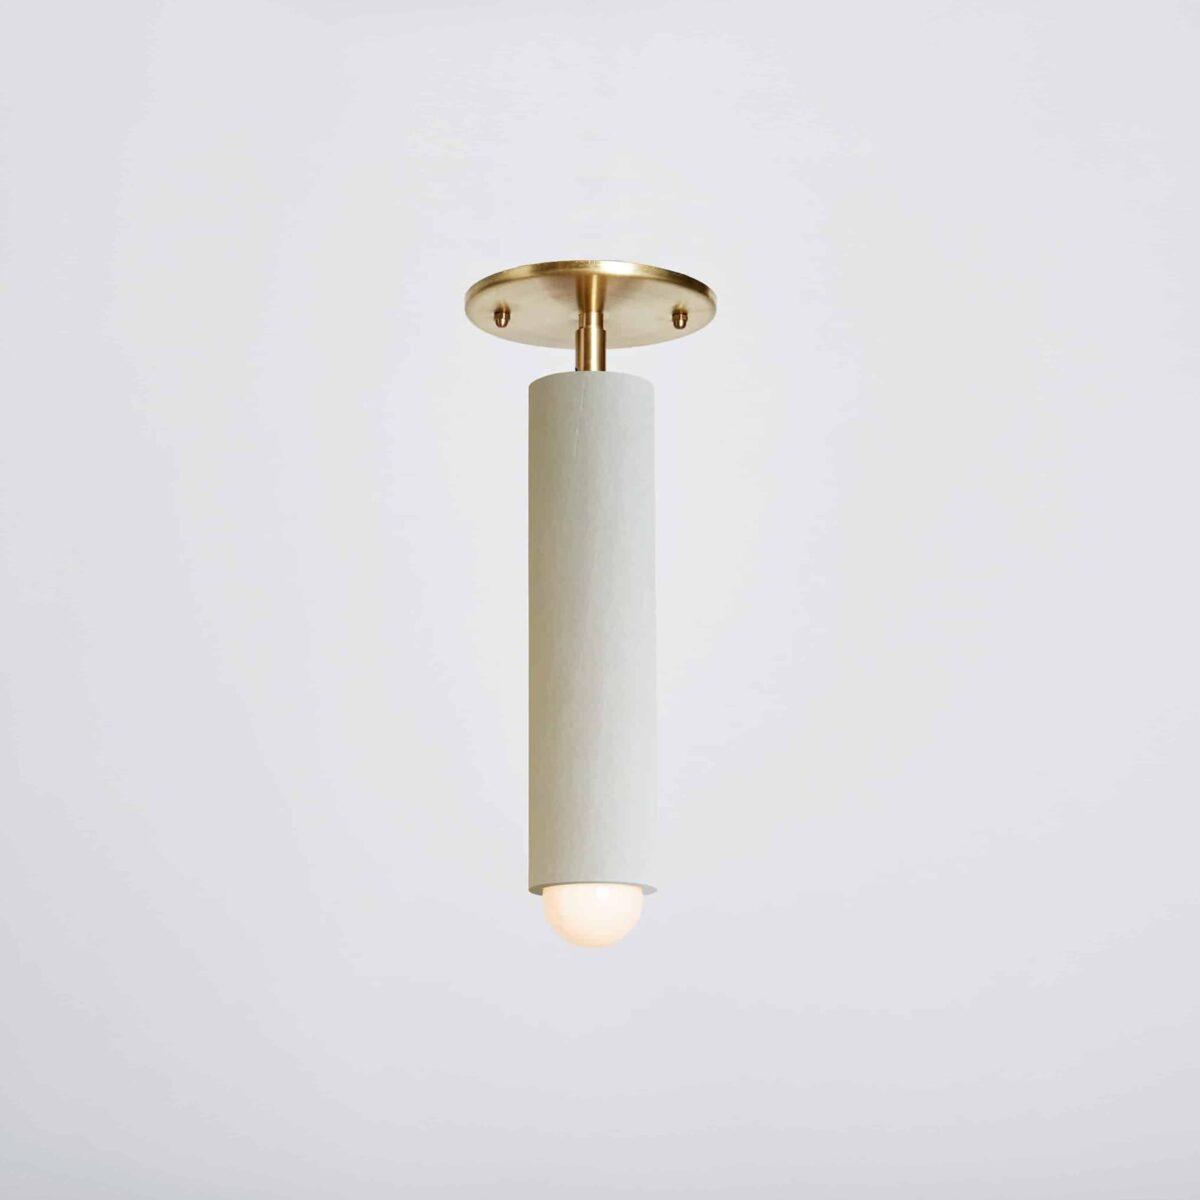 Lodge Flushmount_Painted_On_white-Hewn Brass